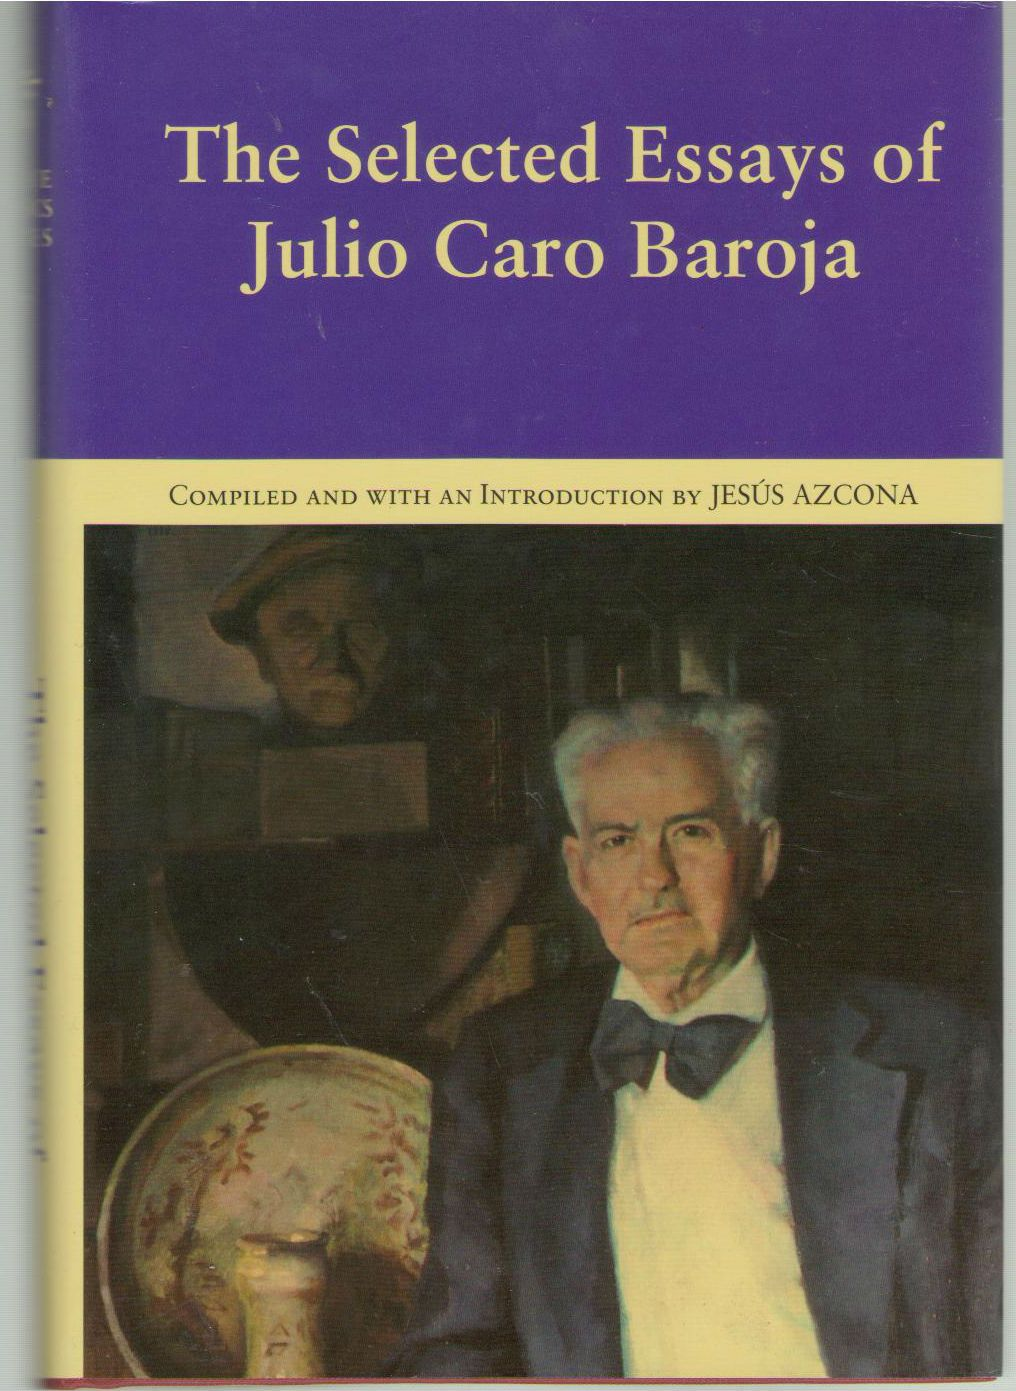 The Selected Essays of Julio Caro Baroja, Julio Caro Baroja